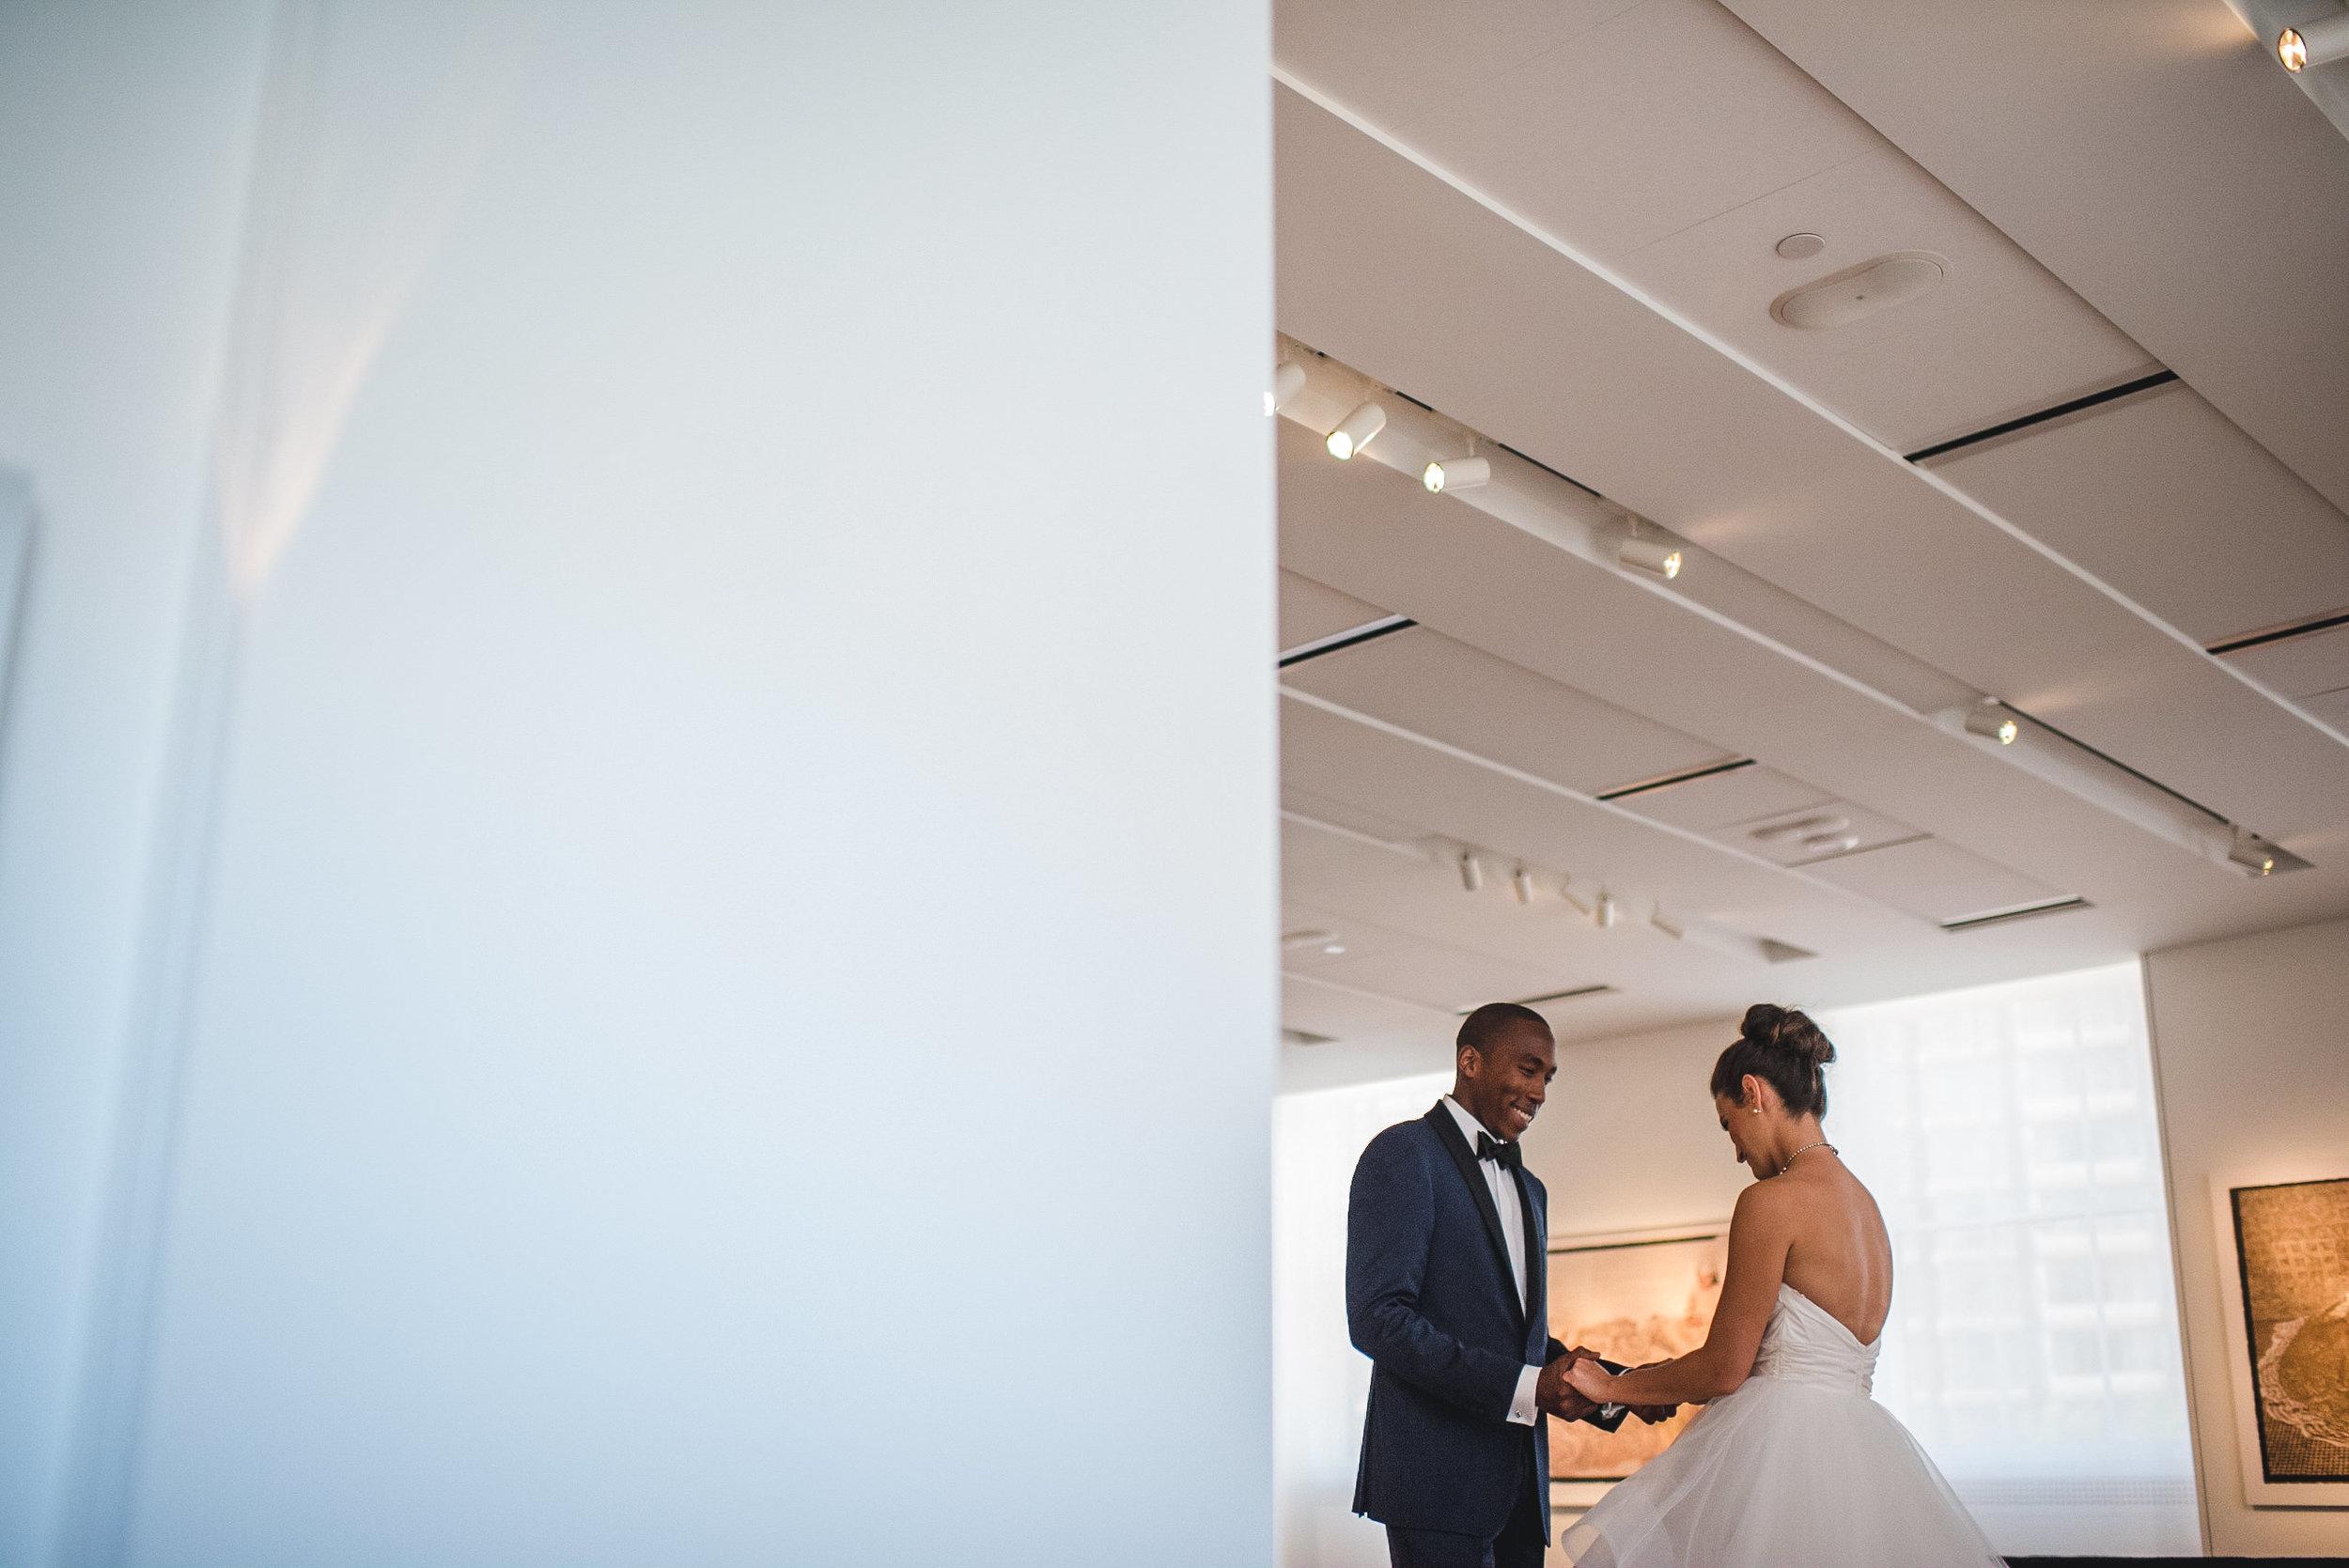 21c Museum Hotel Durham North Carolina Wedding-47.jpg